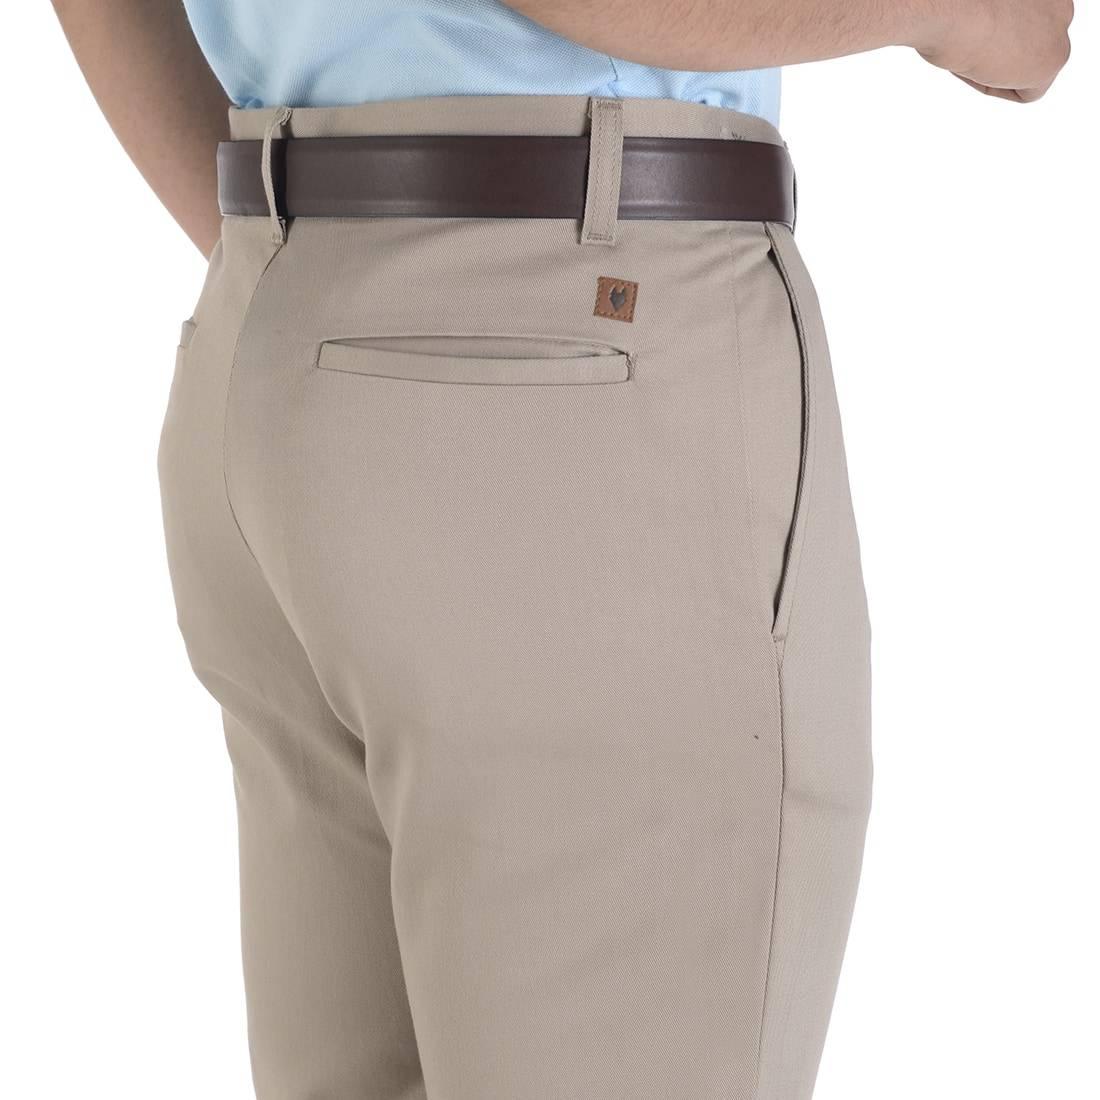 010789055267-04-Pantalon-Casual-Classic-Fit-Beige-yale